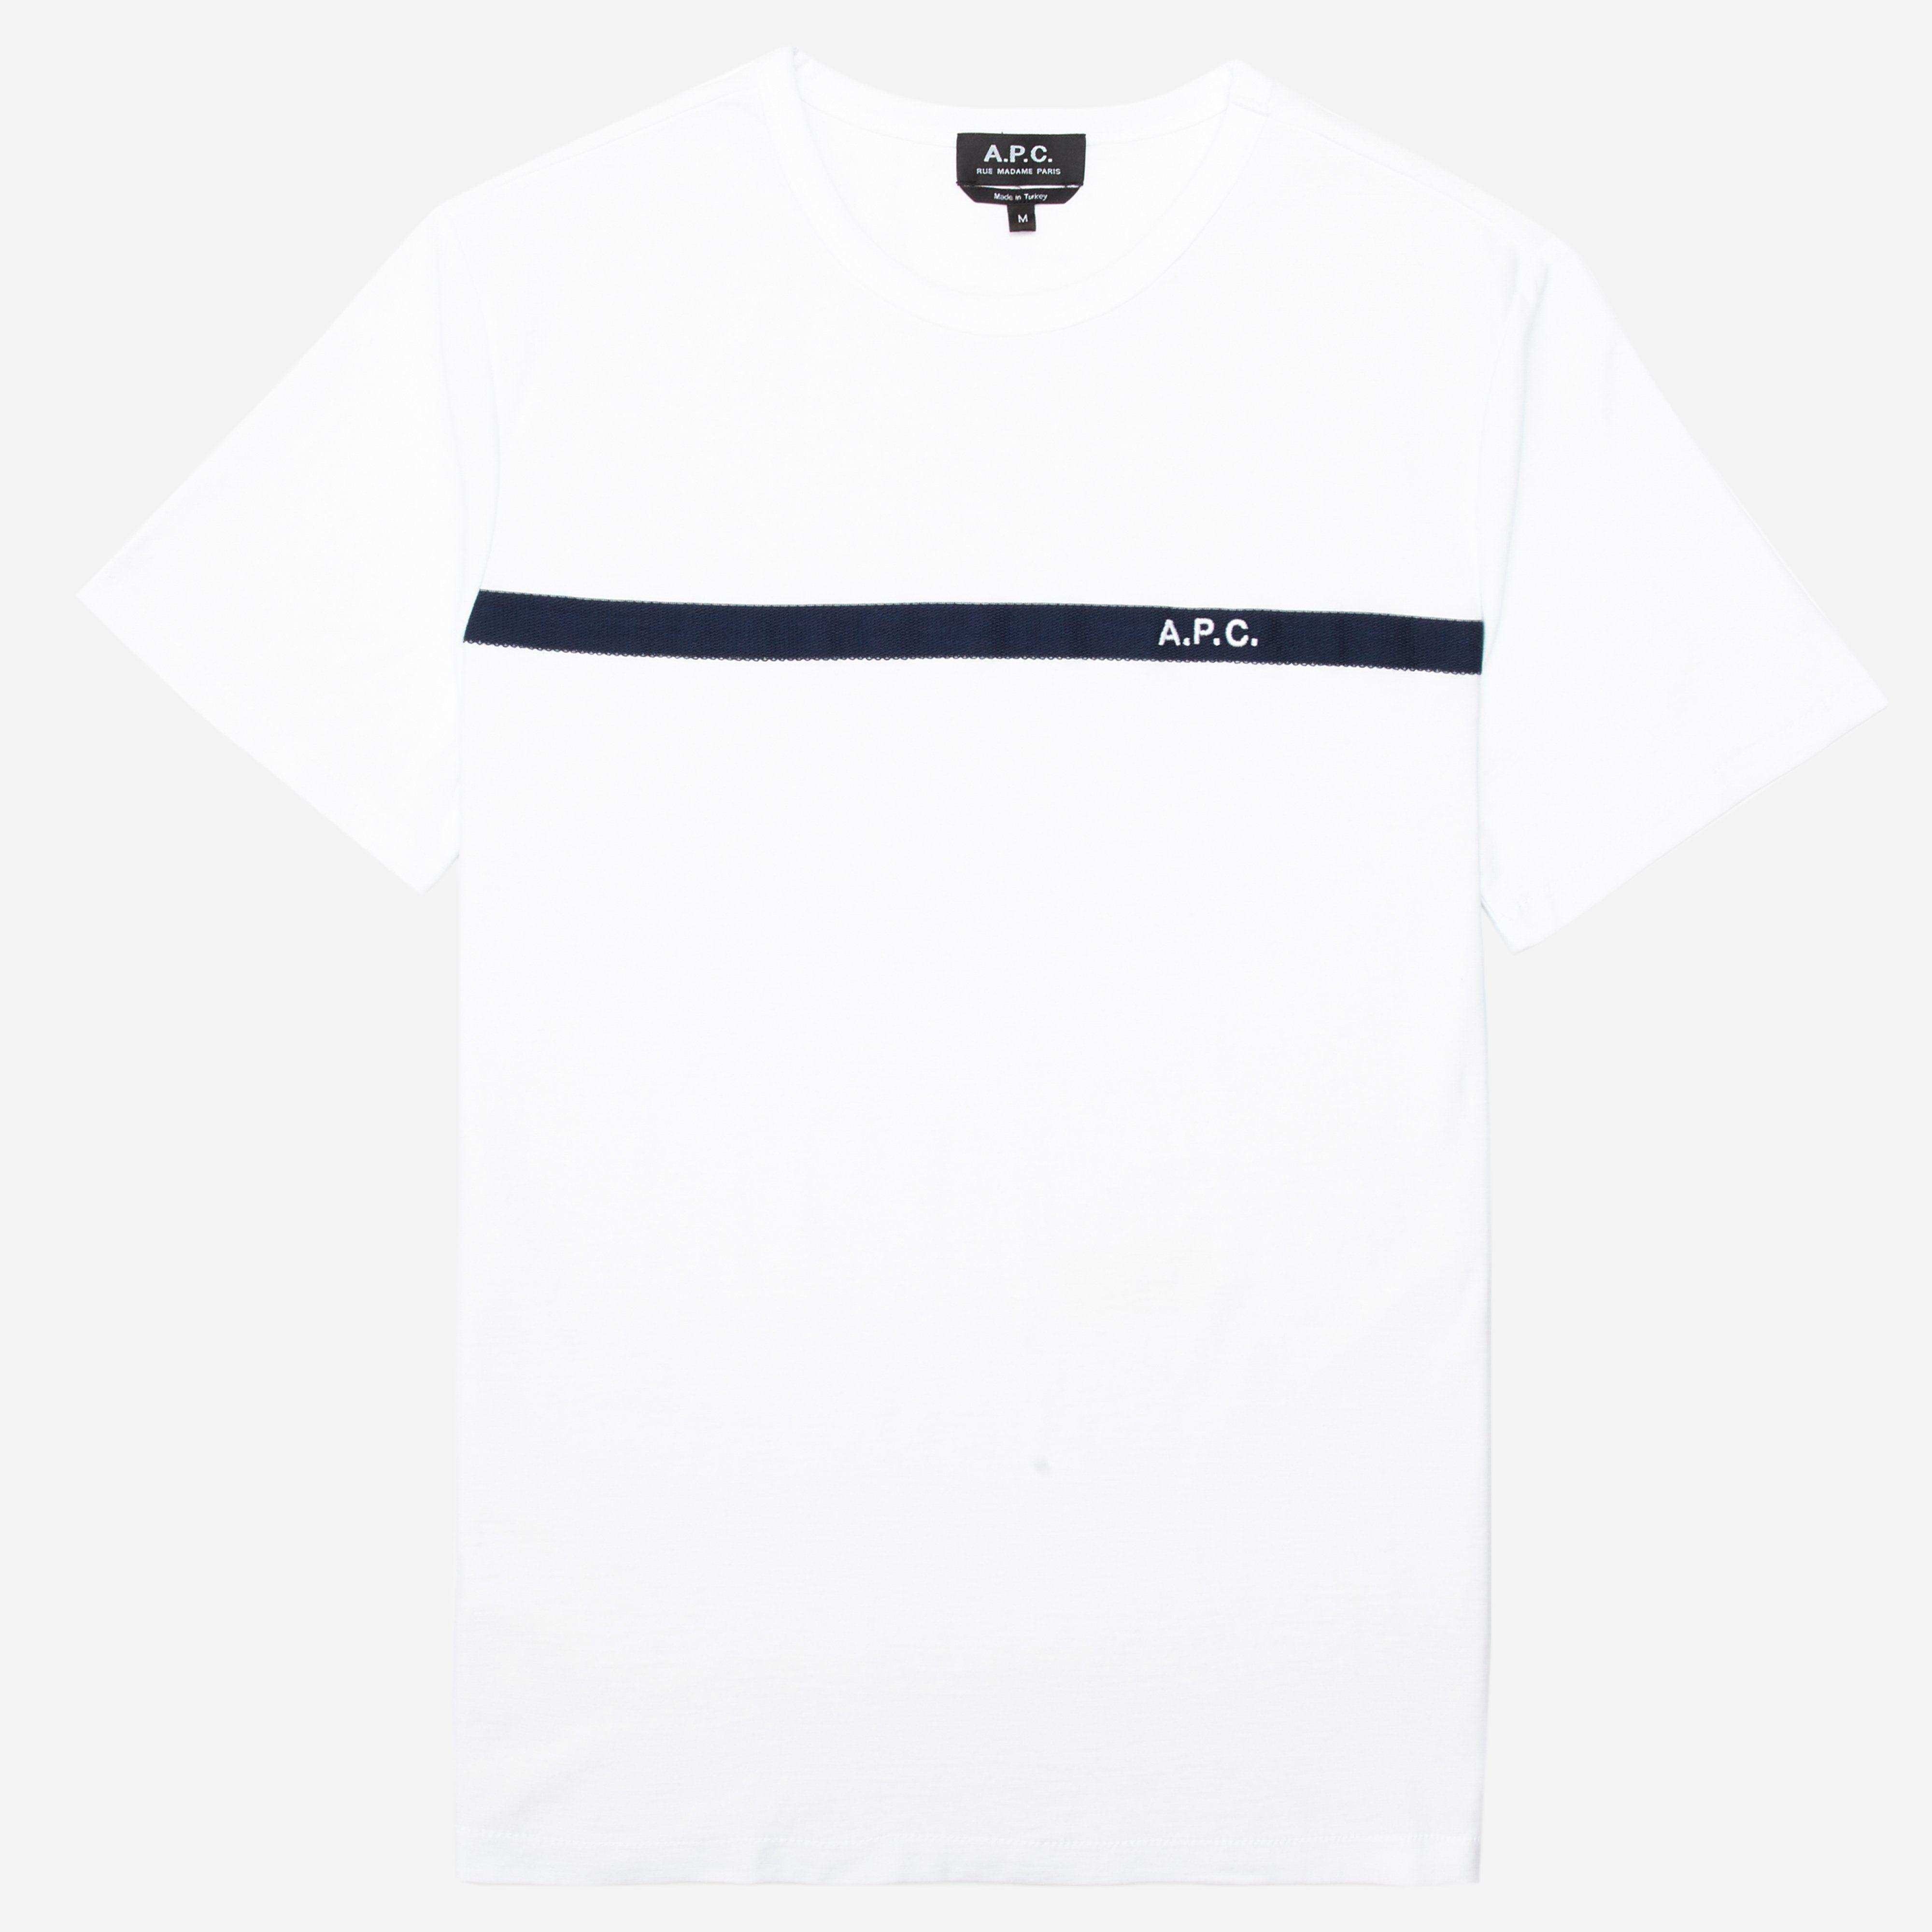 A.P.C. Yukata T-shirt